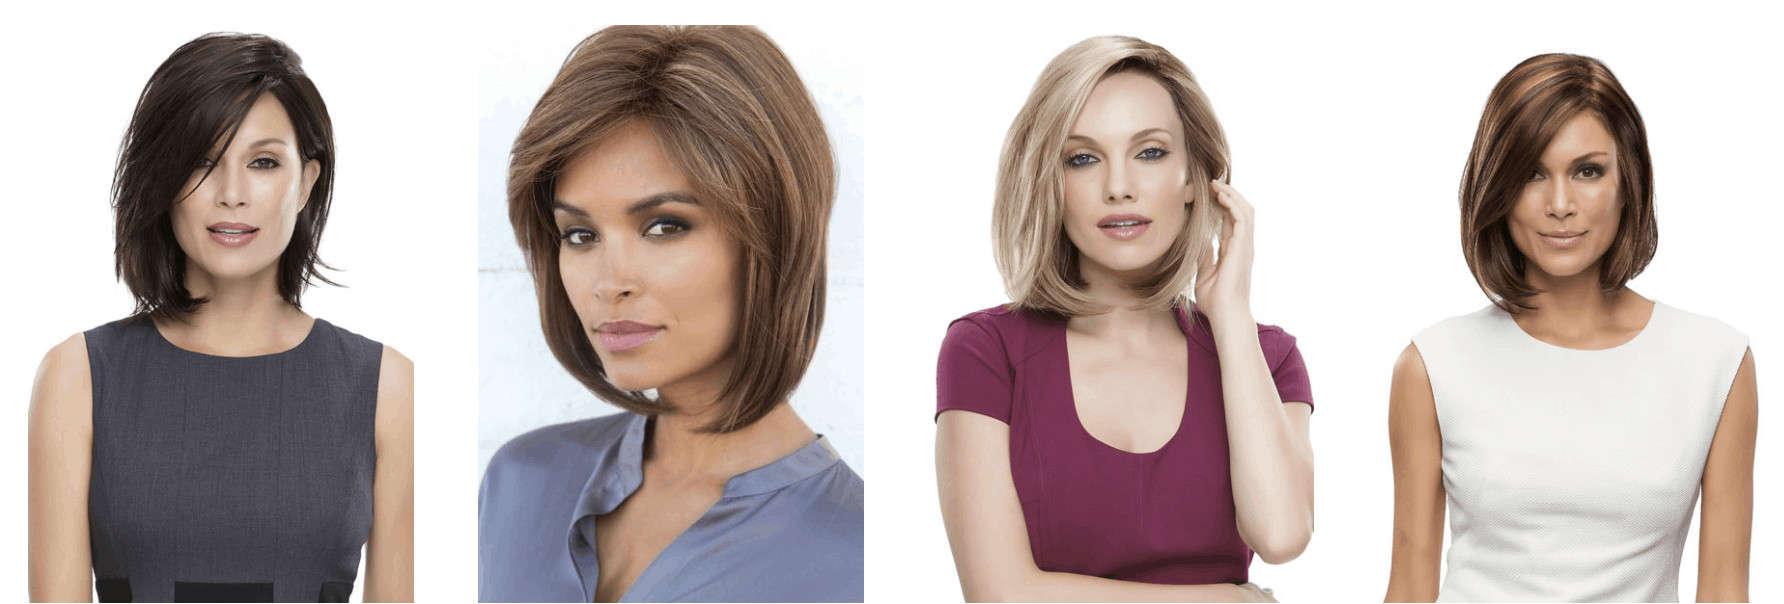 Medium-length wig examples